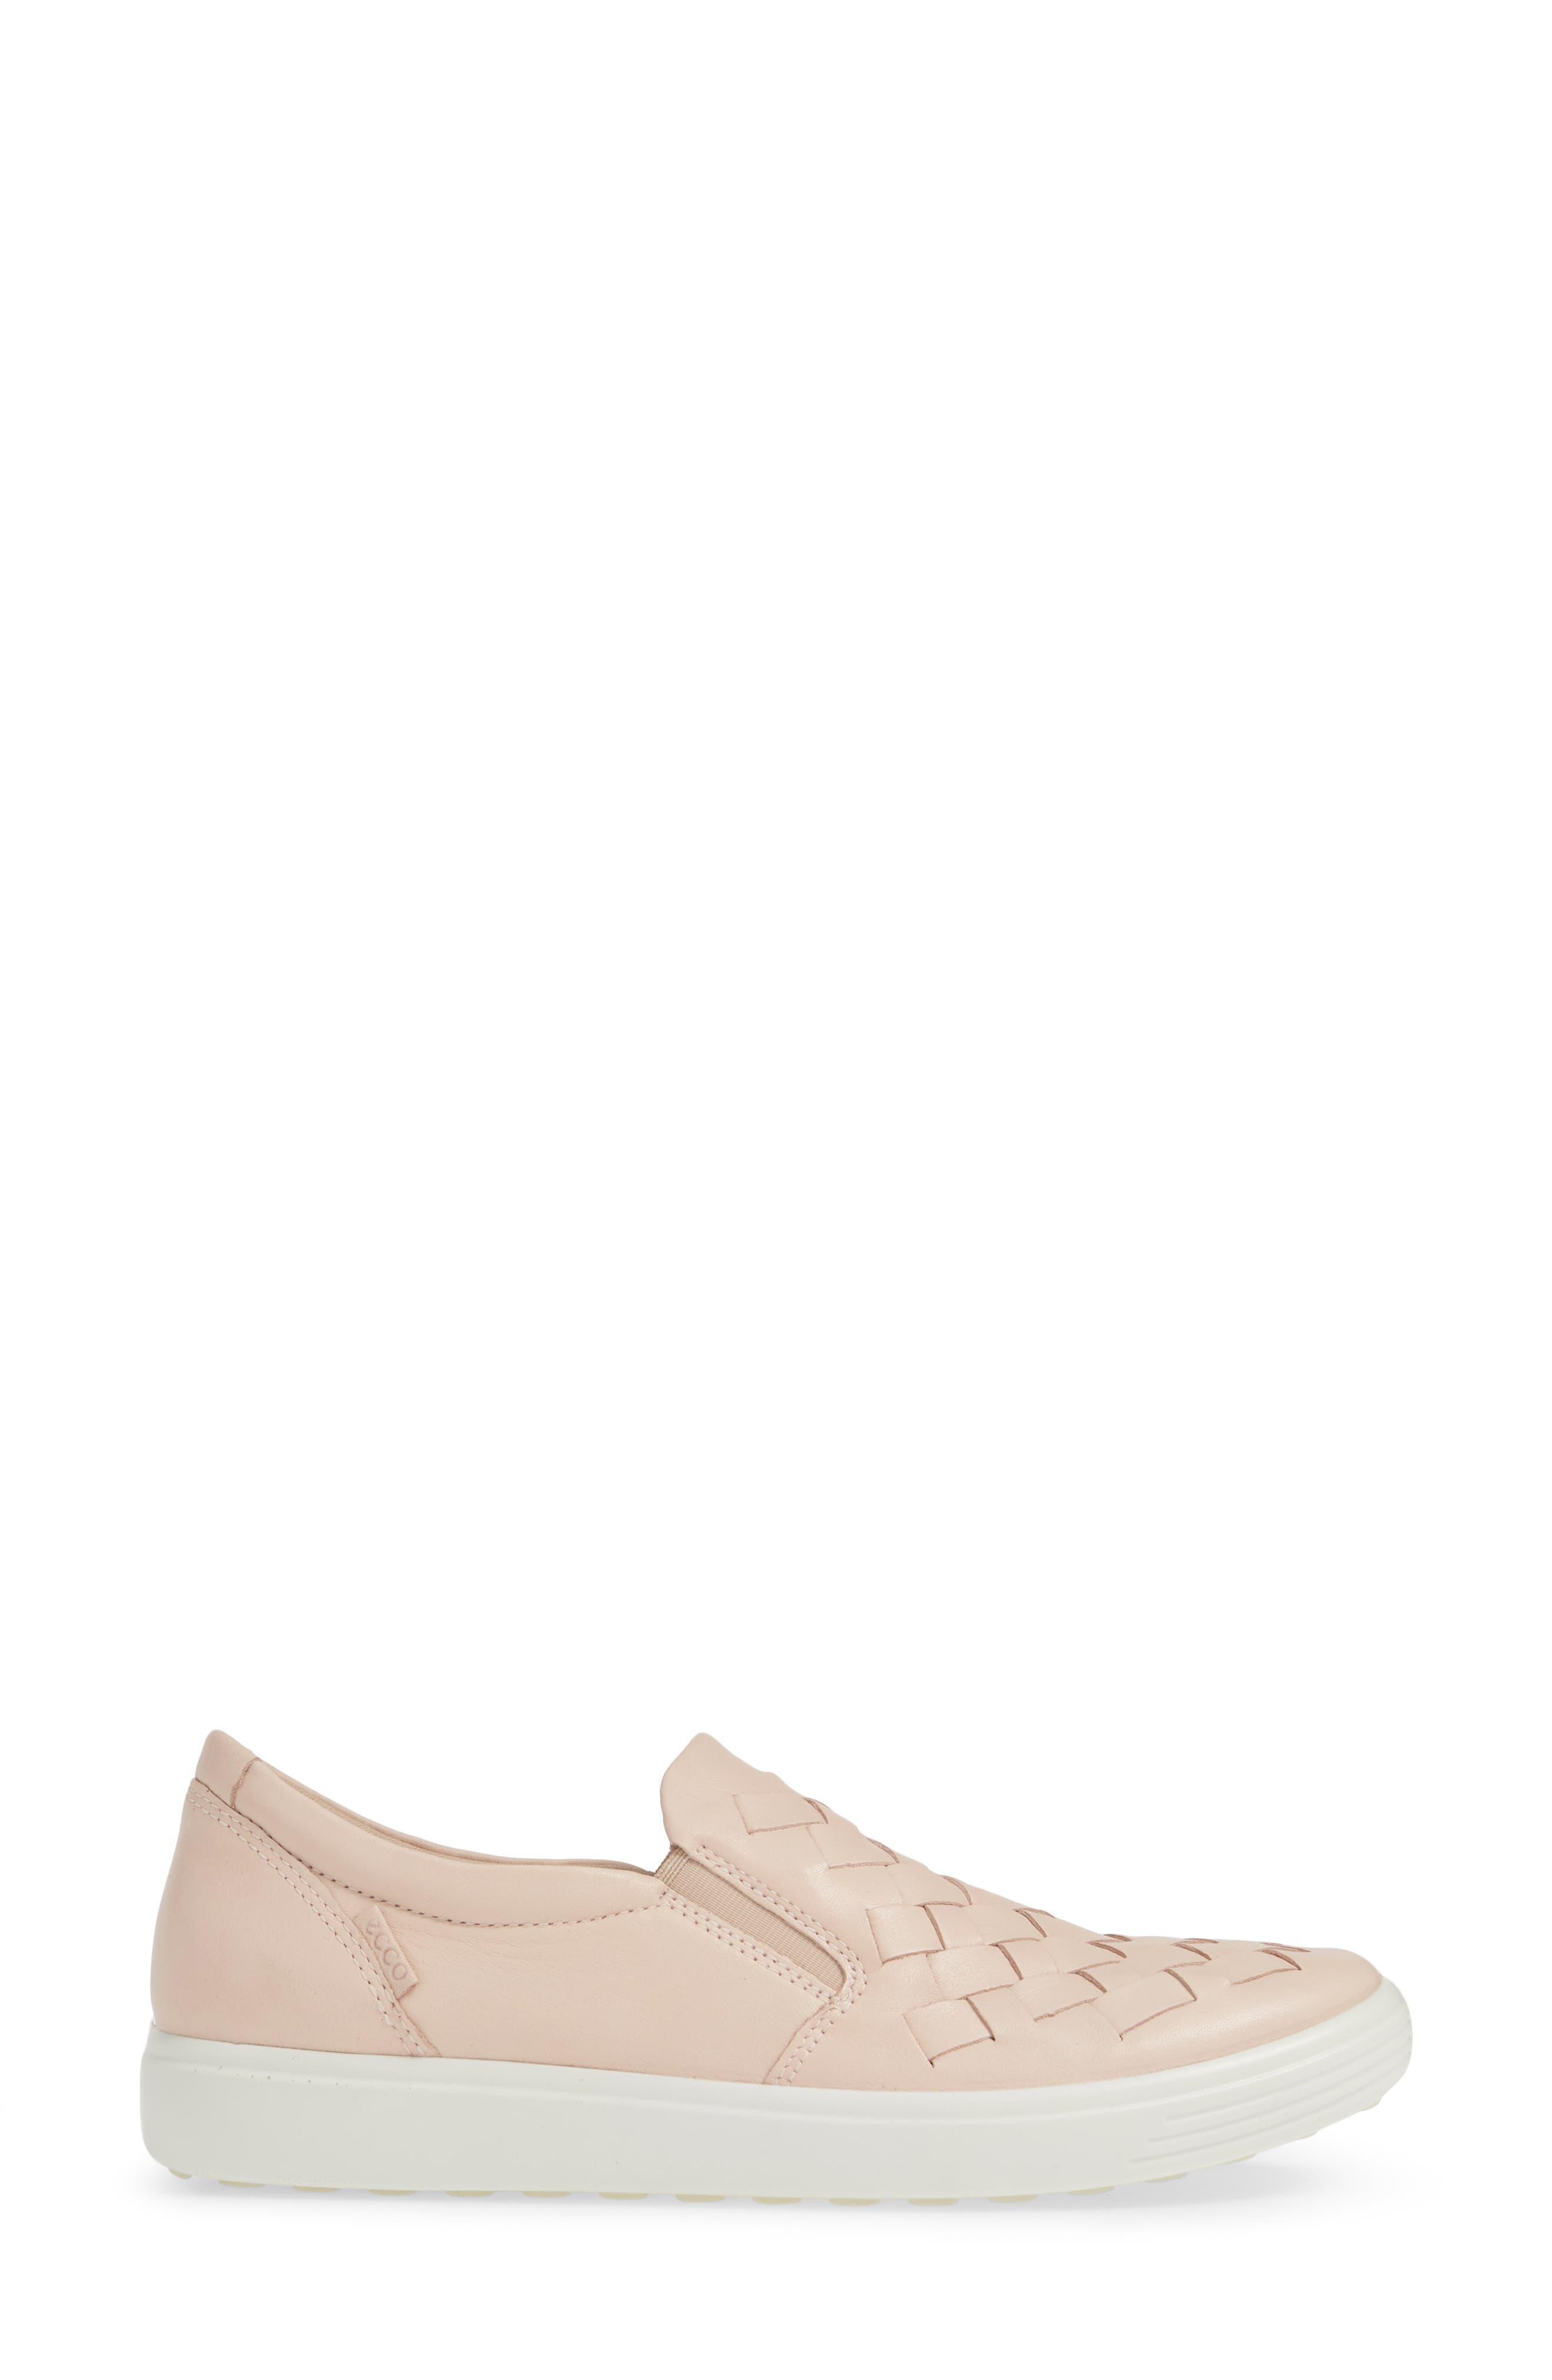 ECCO, Soft 7 Woven Slip-On Sneaker, Alternate thumbnail 3, color, ROSE DUST LEATHER